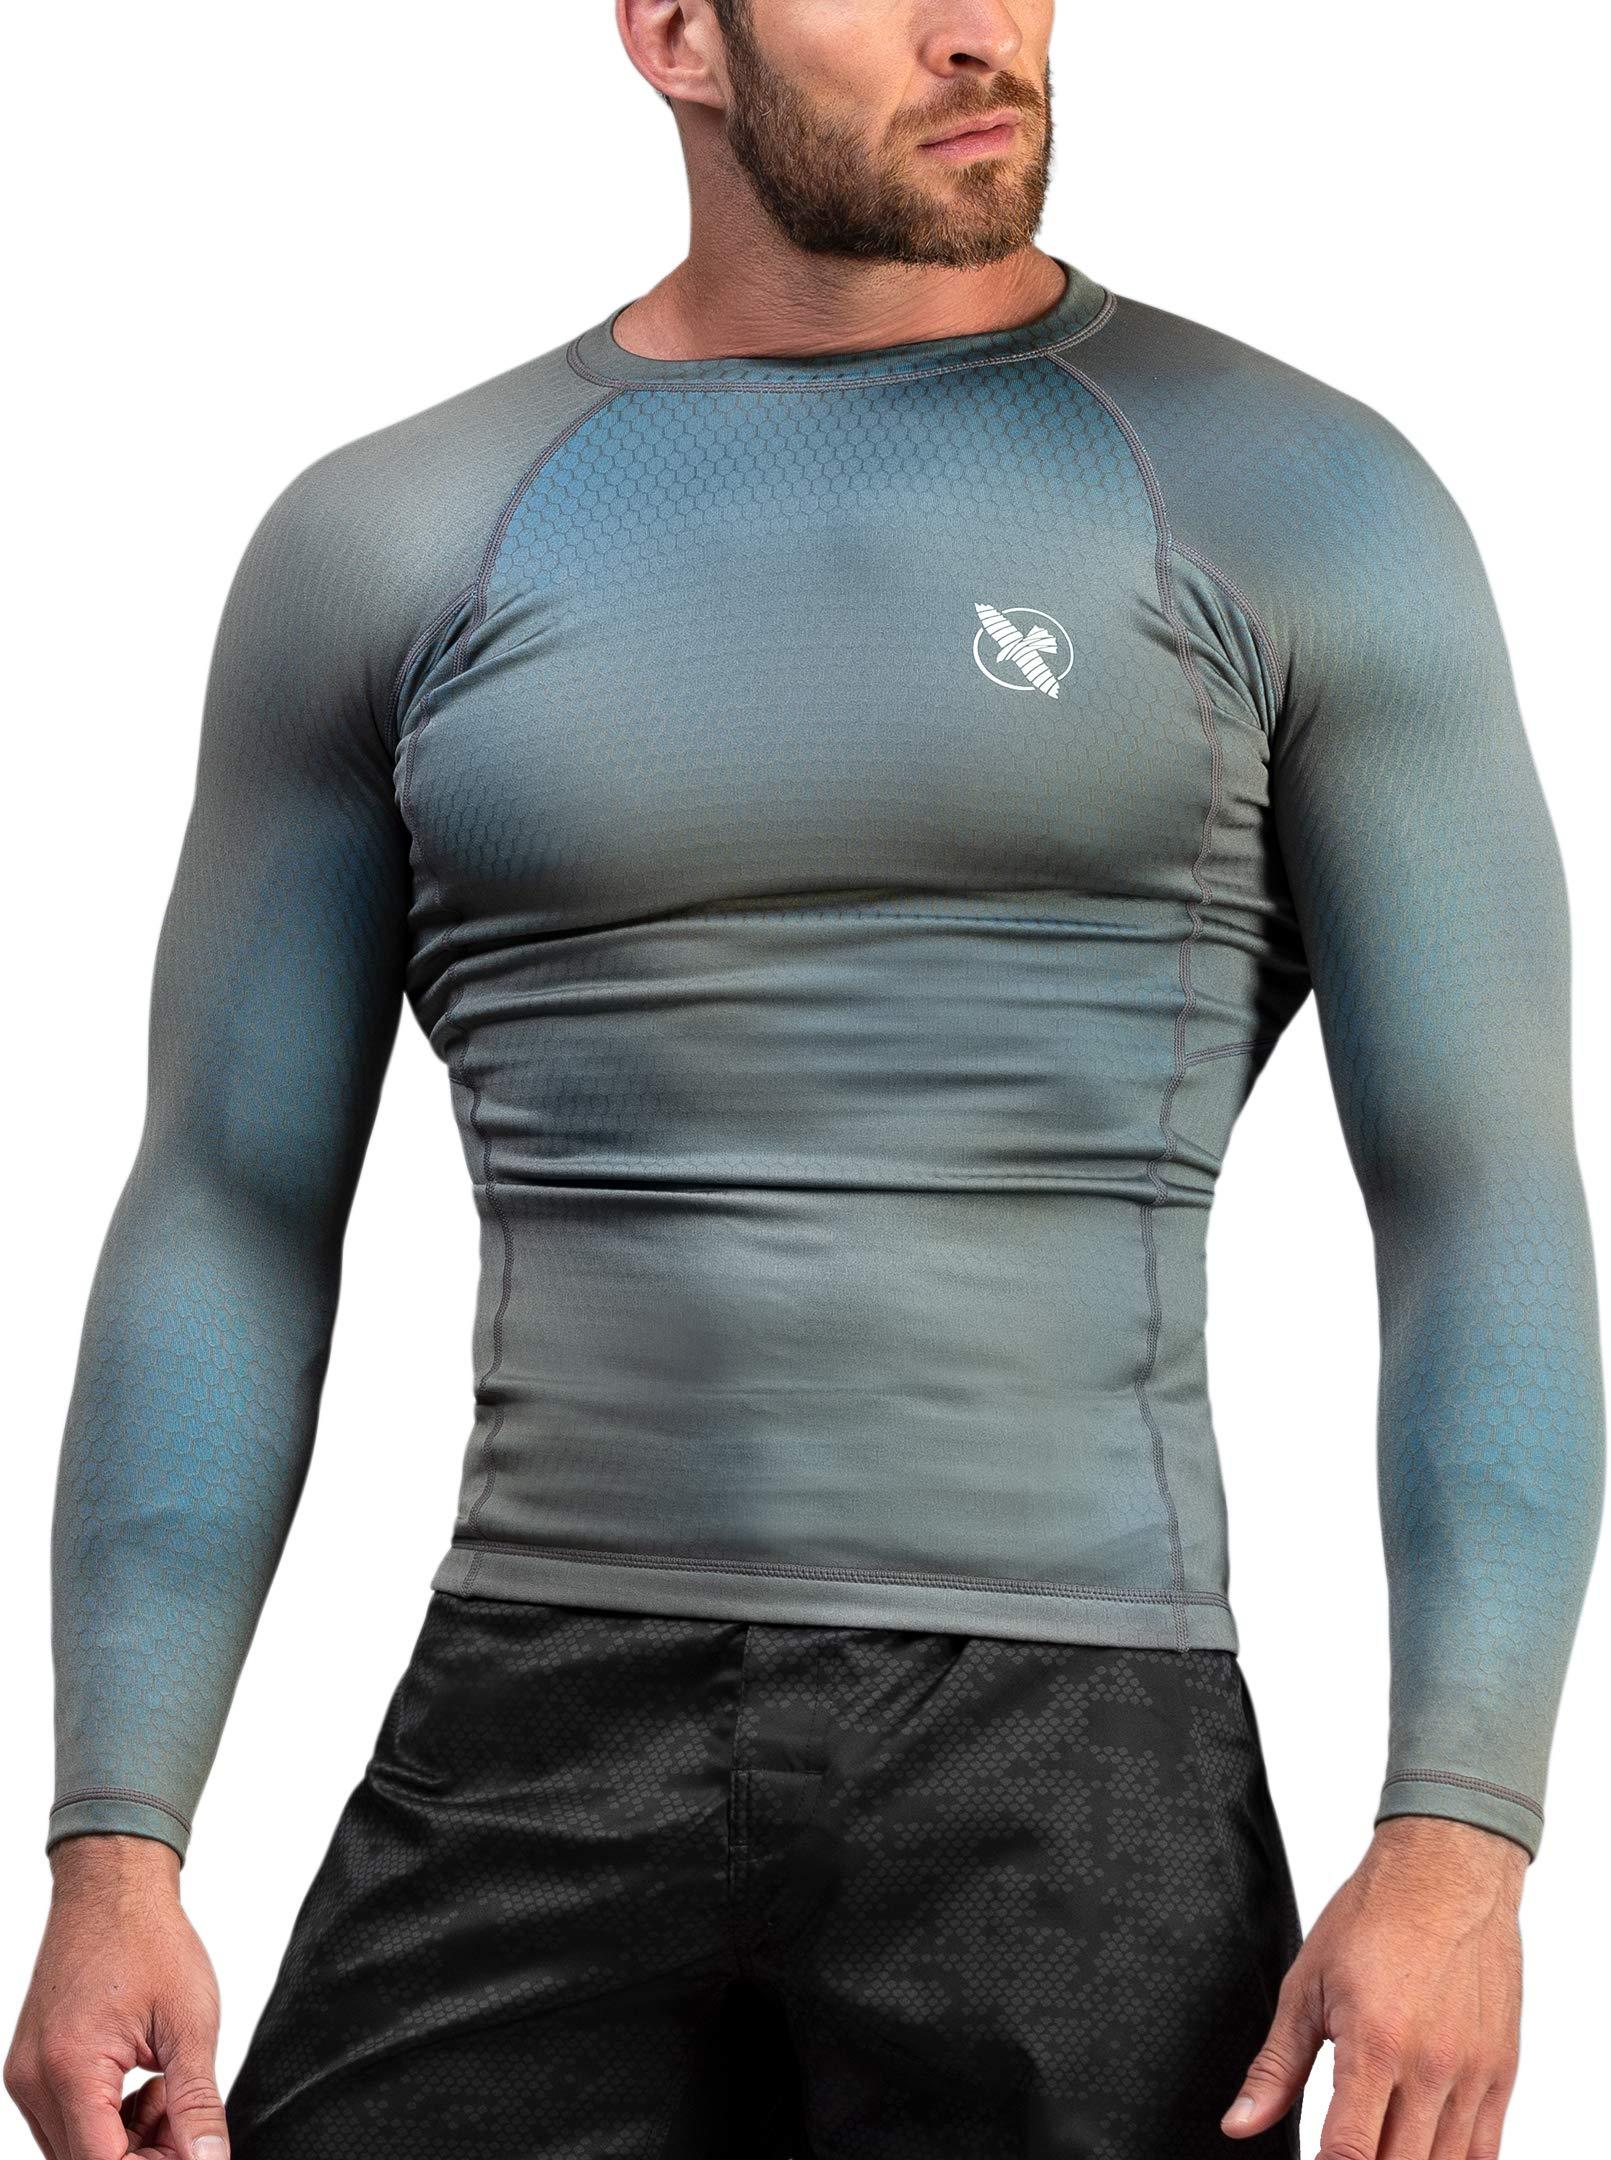 Hayabusa | Men's Fusion Long Sleeve BJJ Rash Guard | Grey/Aqua | M by Hayabusa